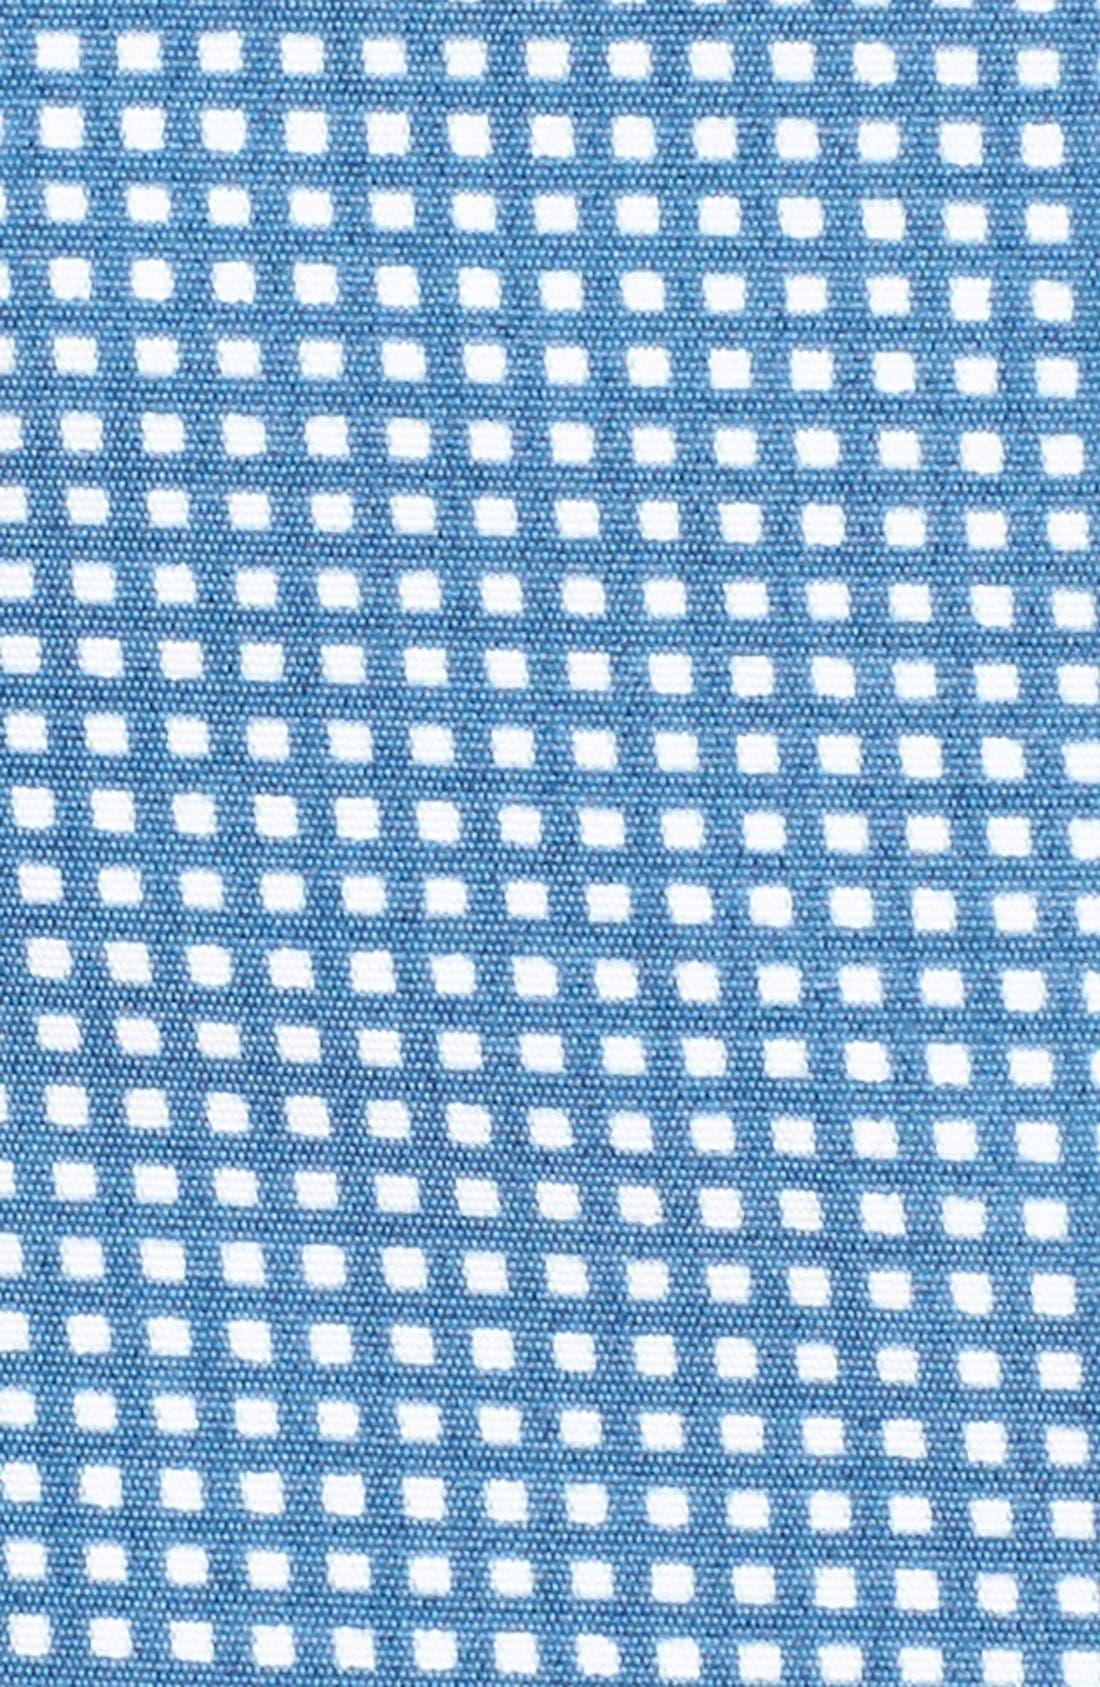 Aruba Tailored Fit Microcheck Swim Trunks,                             Alternate thumbnail 5, color,                             Micro Square Ash Blue